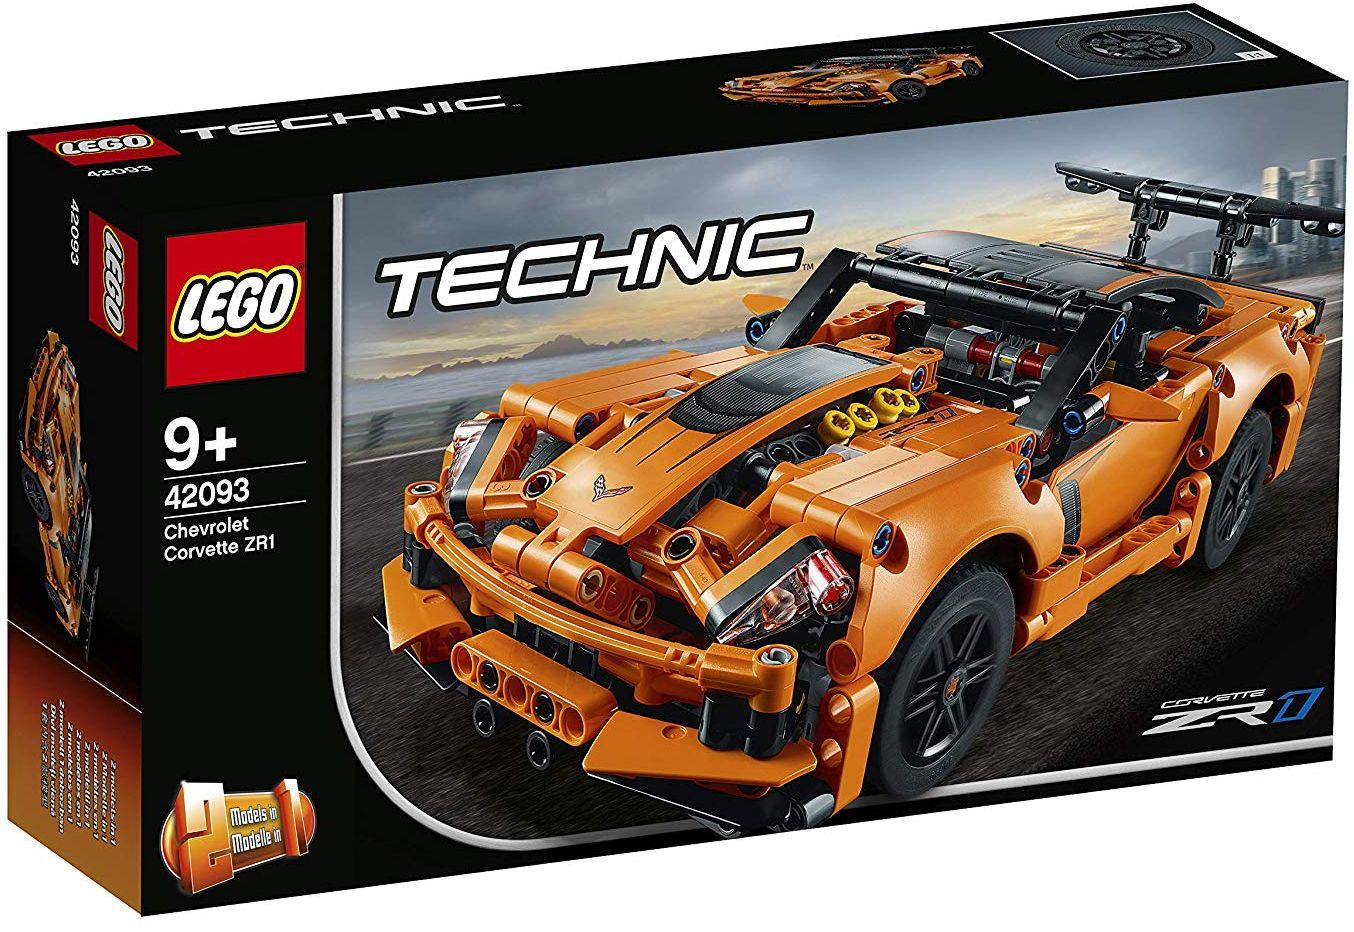 Конструктор Lego Technic - Chevrolet Corvette ZR1 (42093) - 10